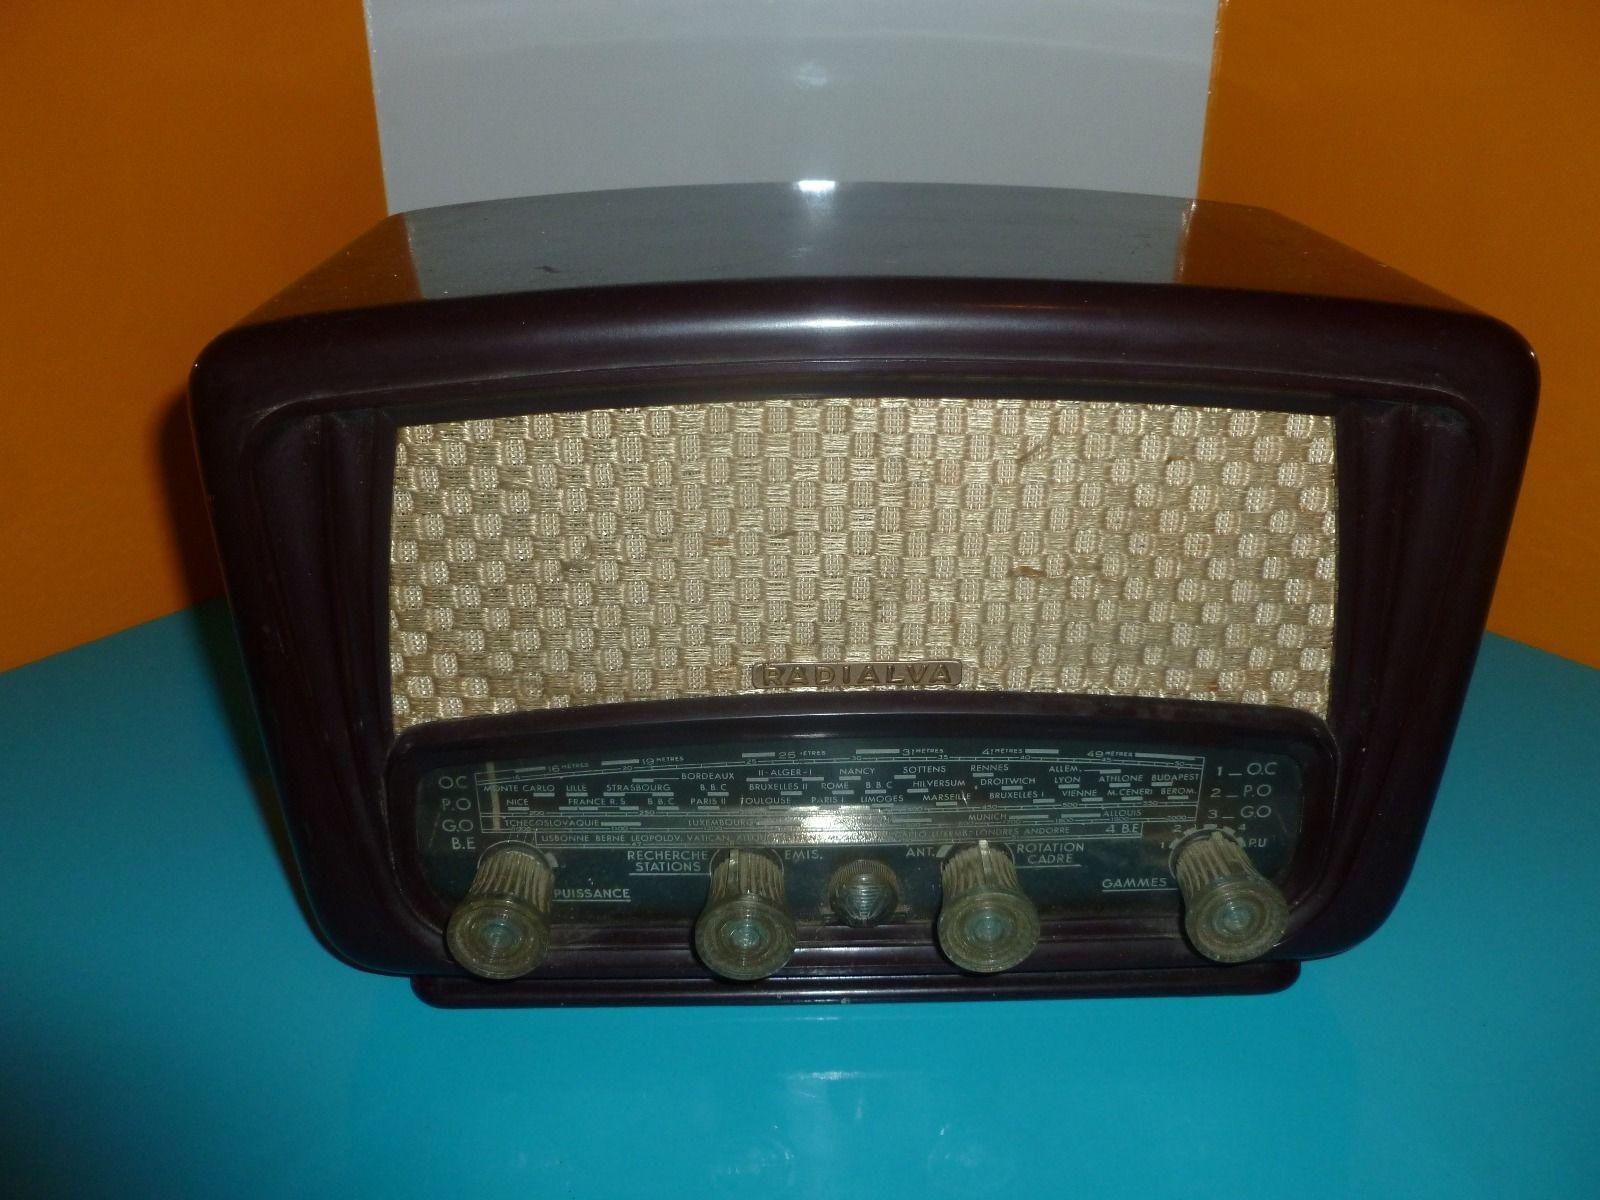 Httppicclickfrancien Poste Radio Tsf Radiosturntabletuberecord Player